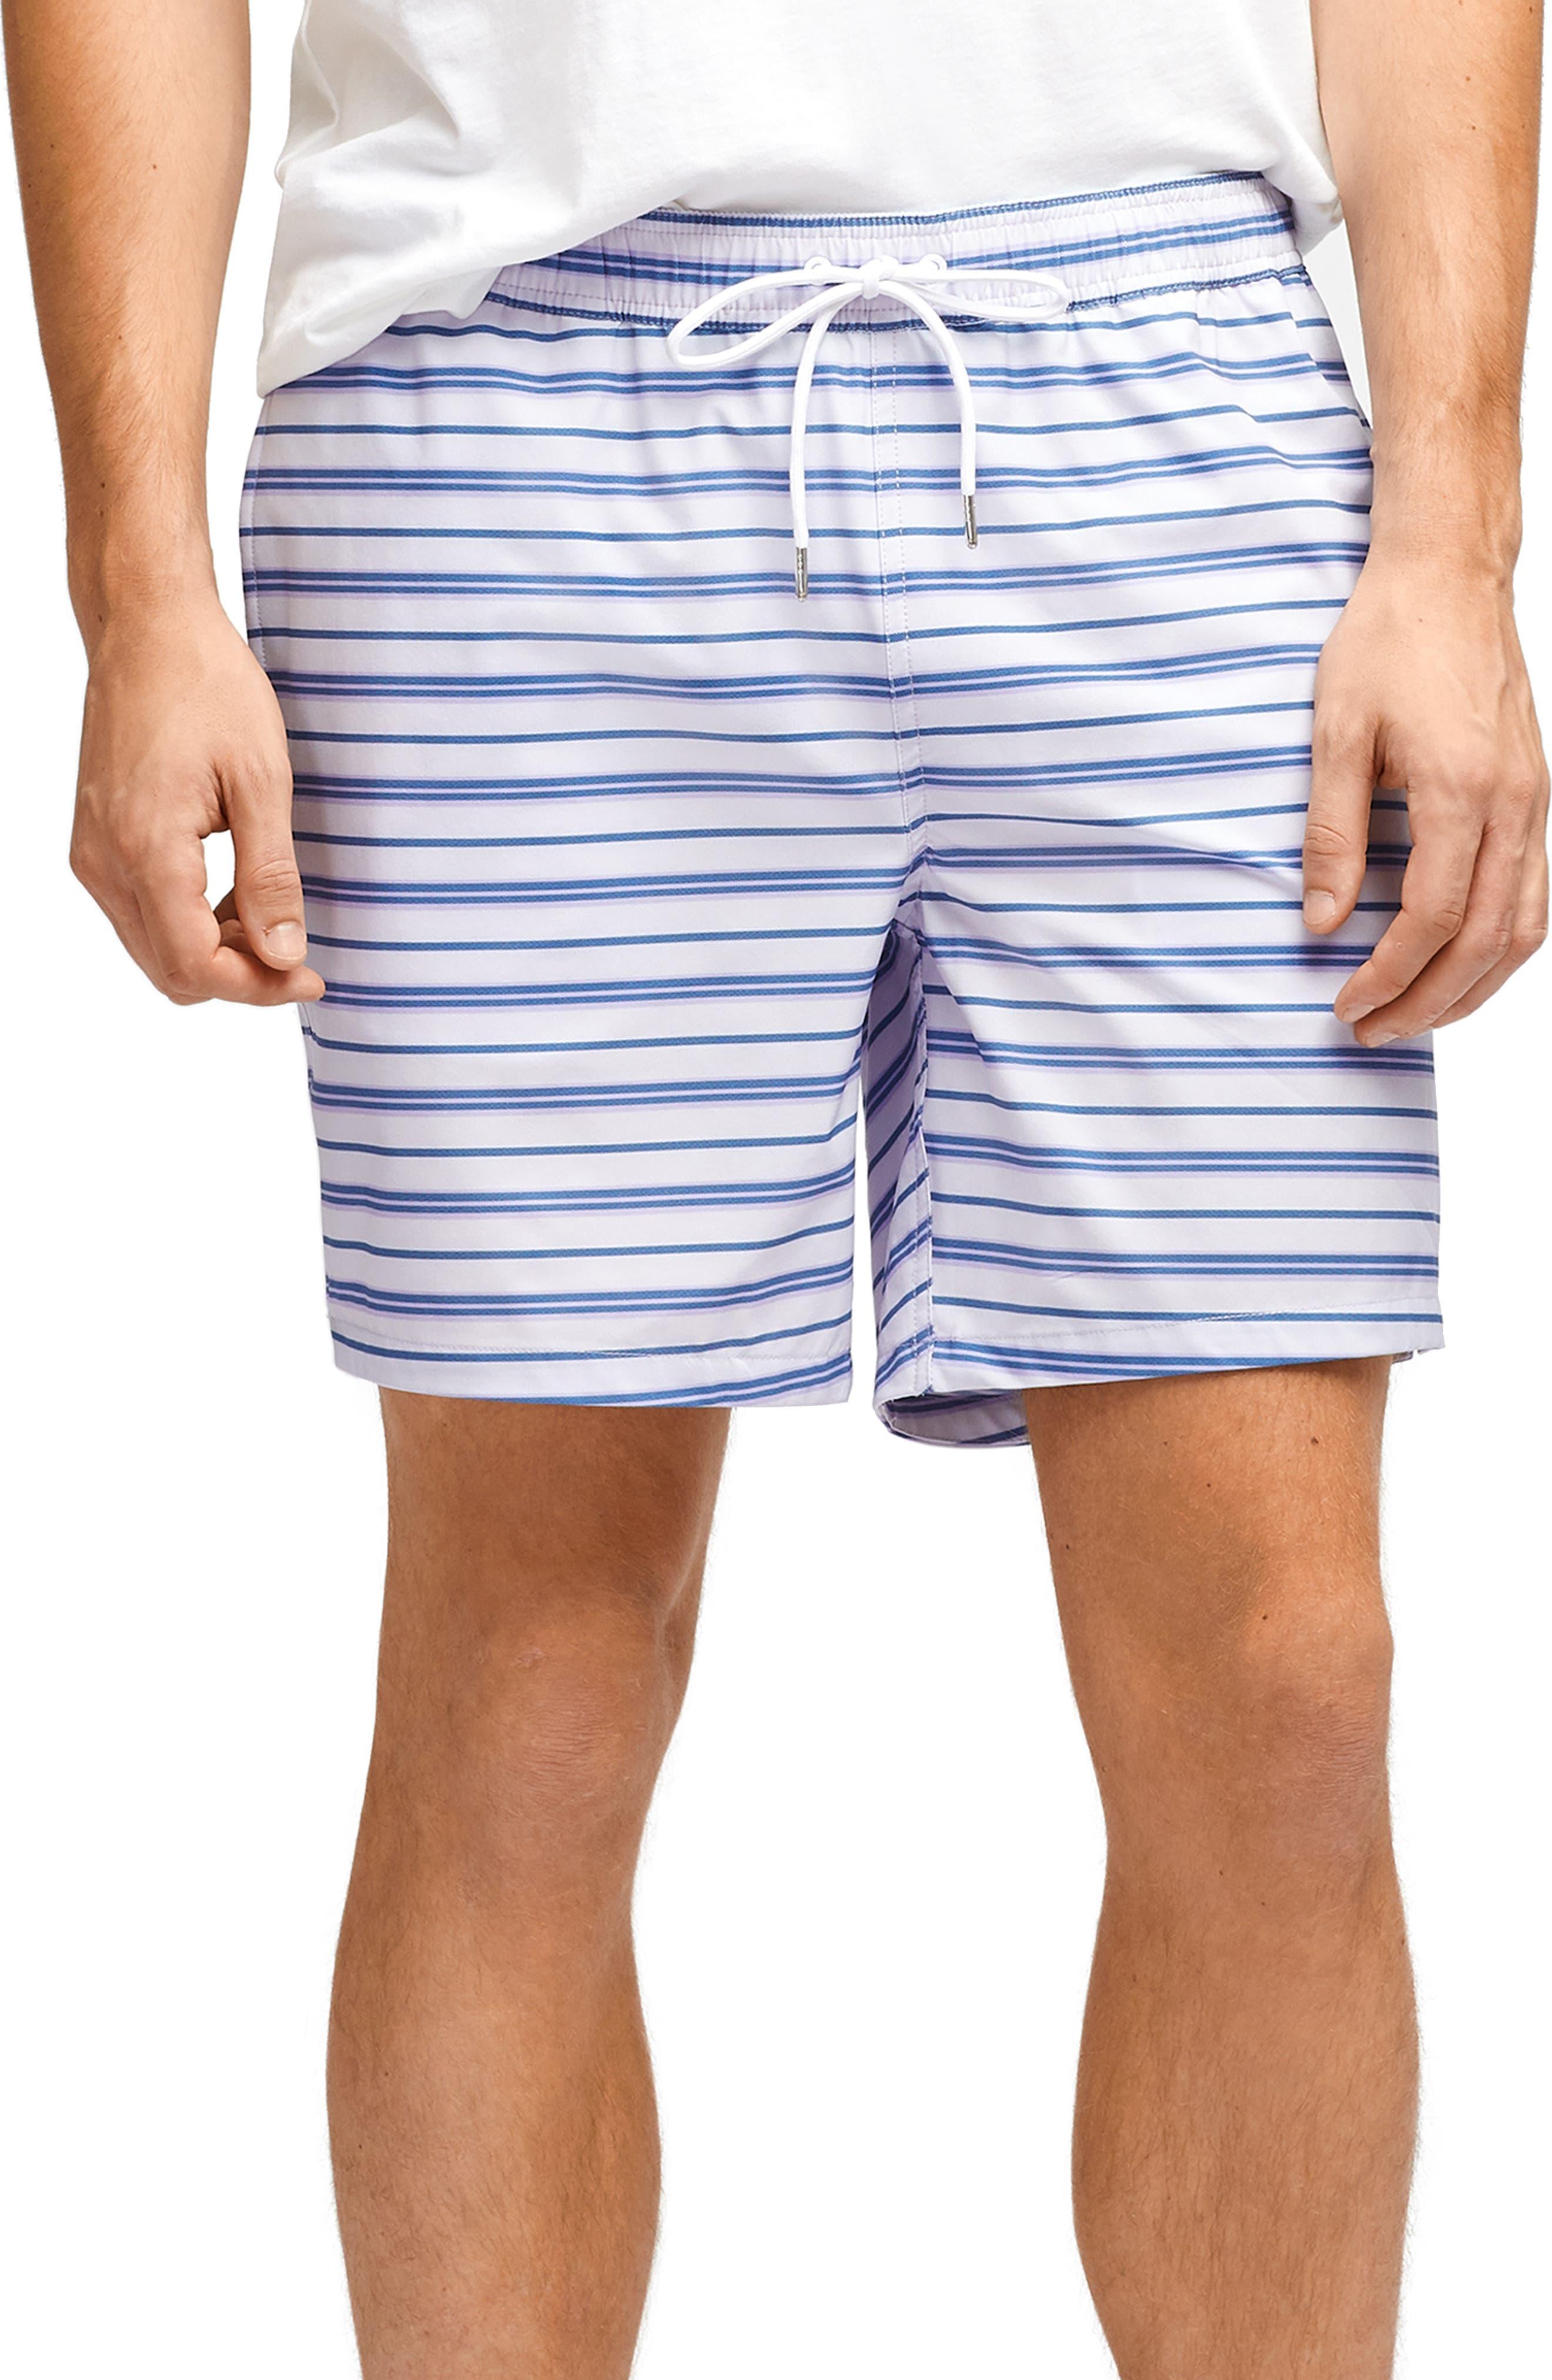 BONOBOS, Banzai 7-Inch Stripe E-Waist Swim Trunks, Main thumbnail 1, color, PURPLE STRIPE